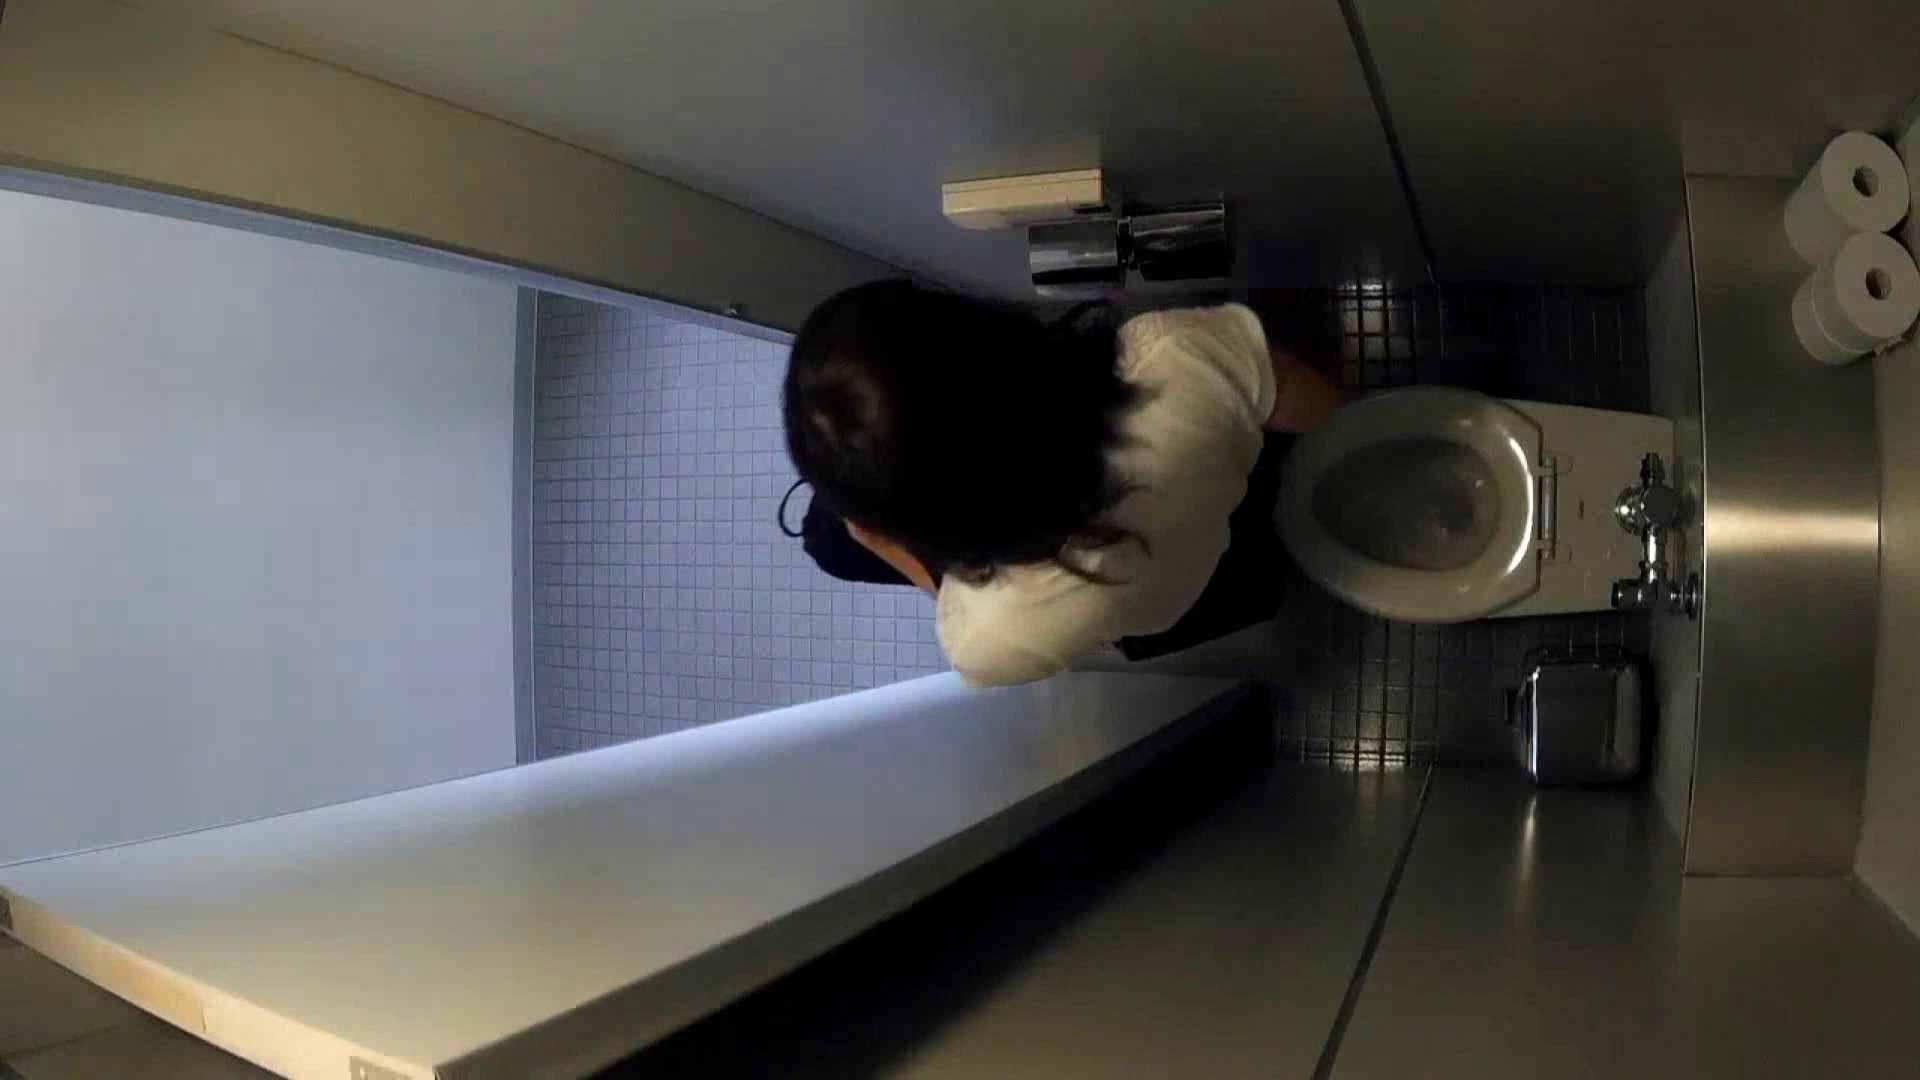 有名大学女性洗面所 vol.45 冴え渡る多方向撮影!職人技です。 潜入  95画像 10